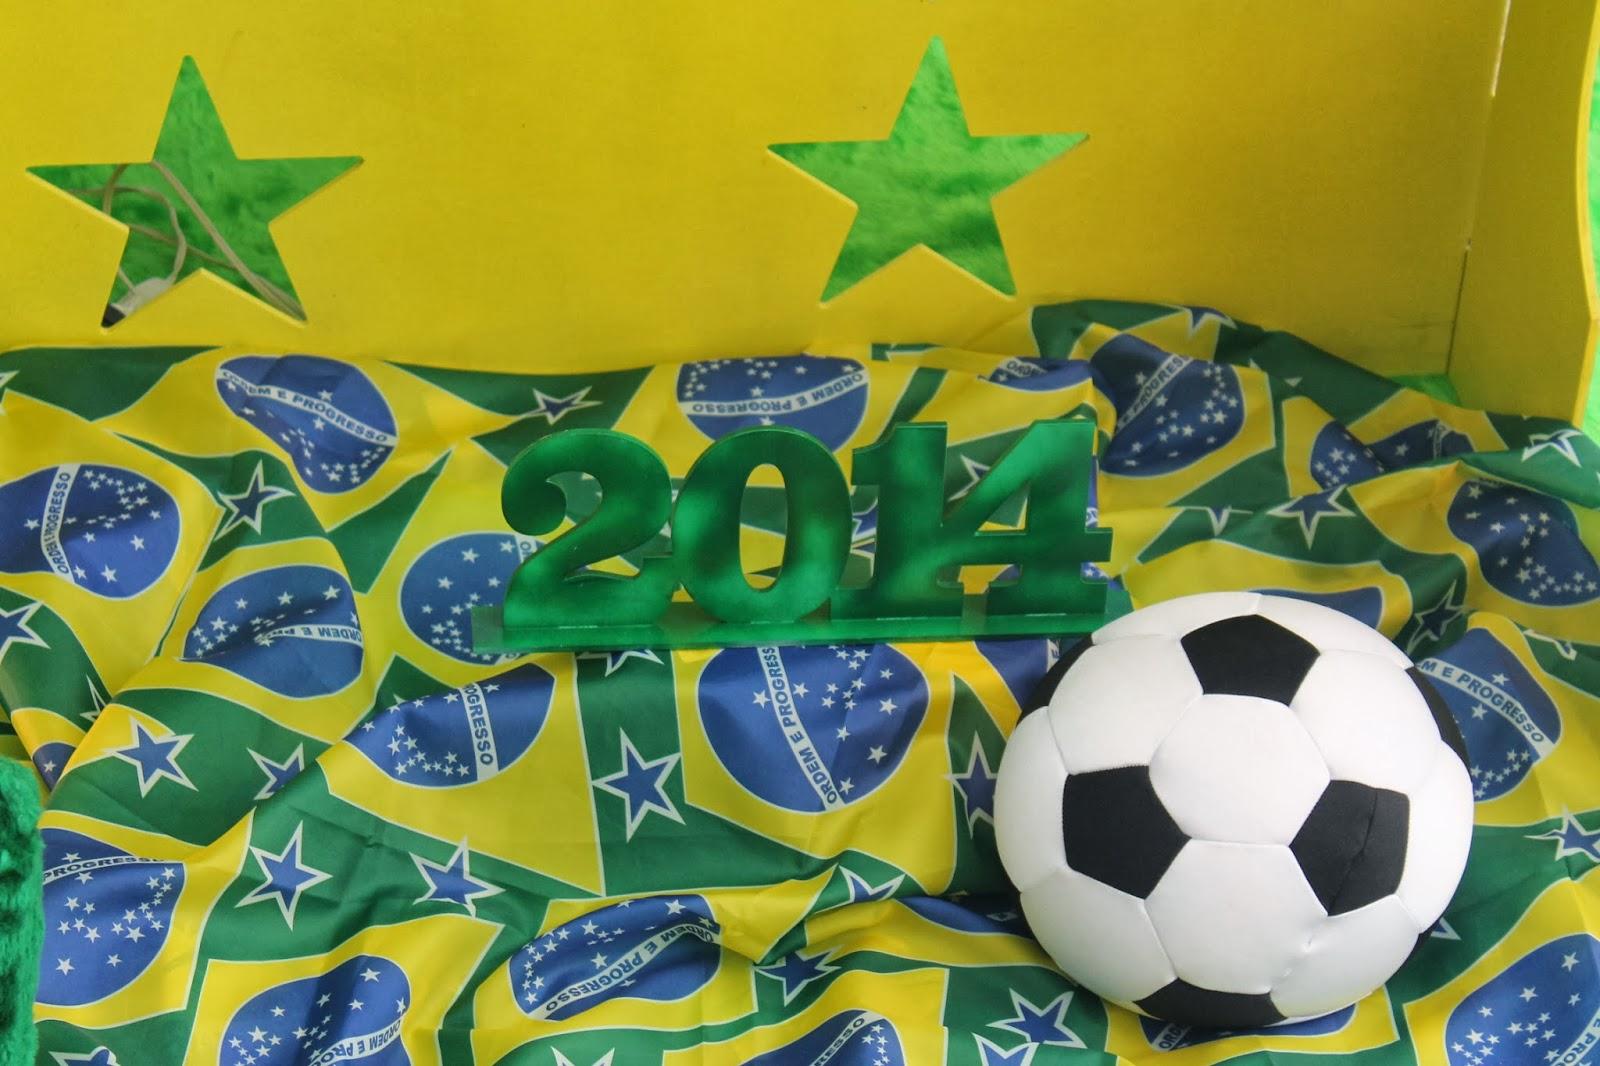 decoracao-para-copa-do-mundo-2014